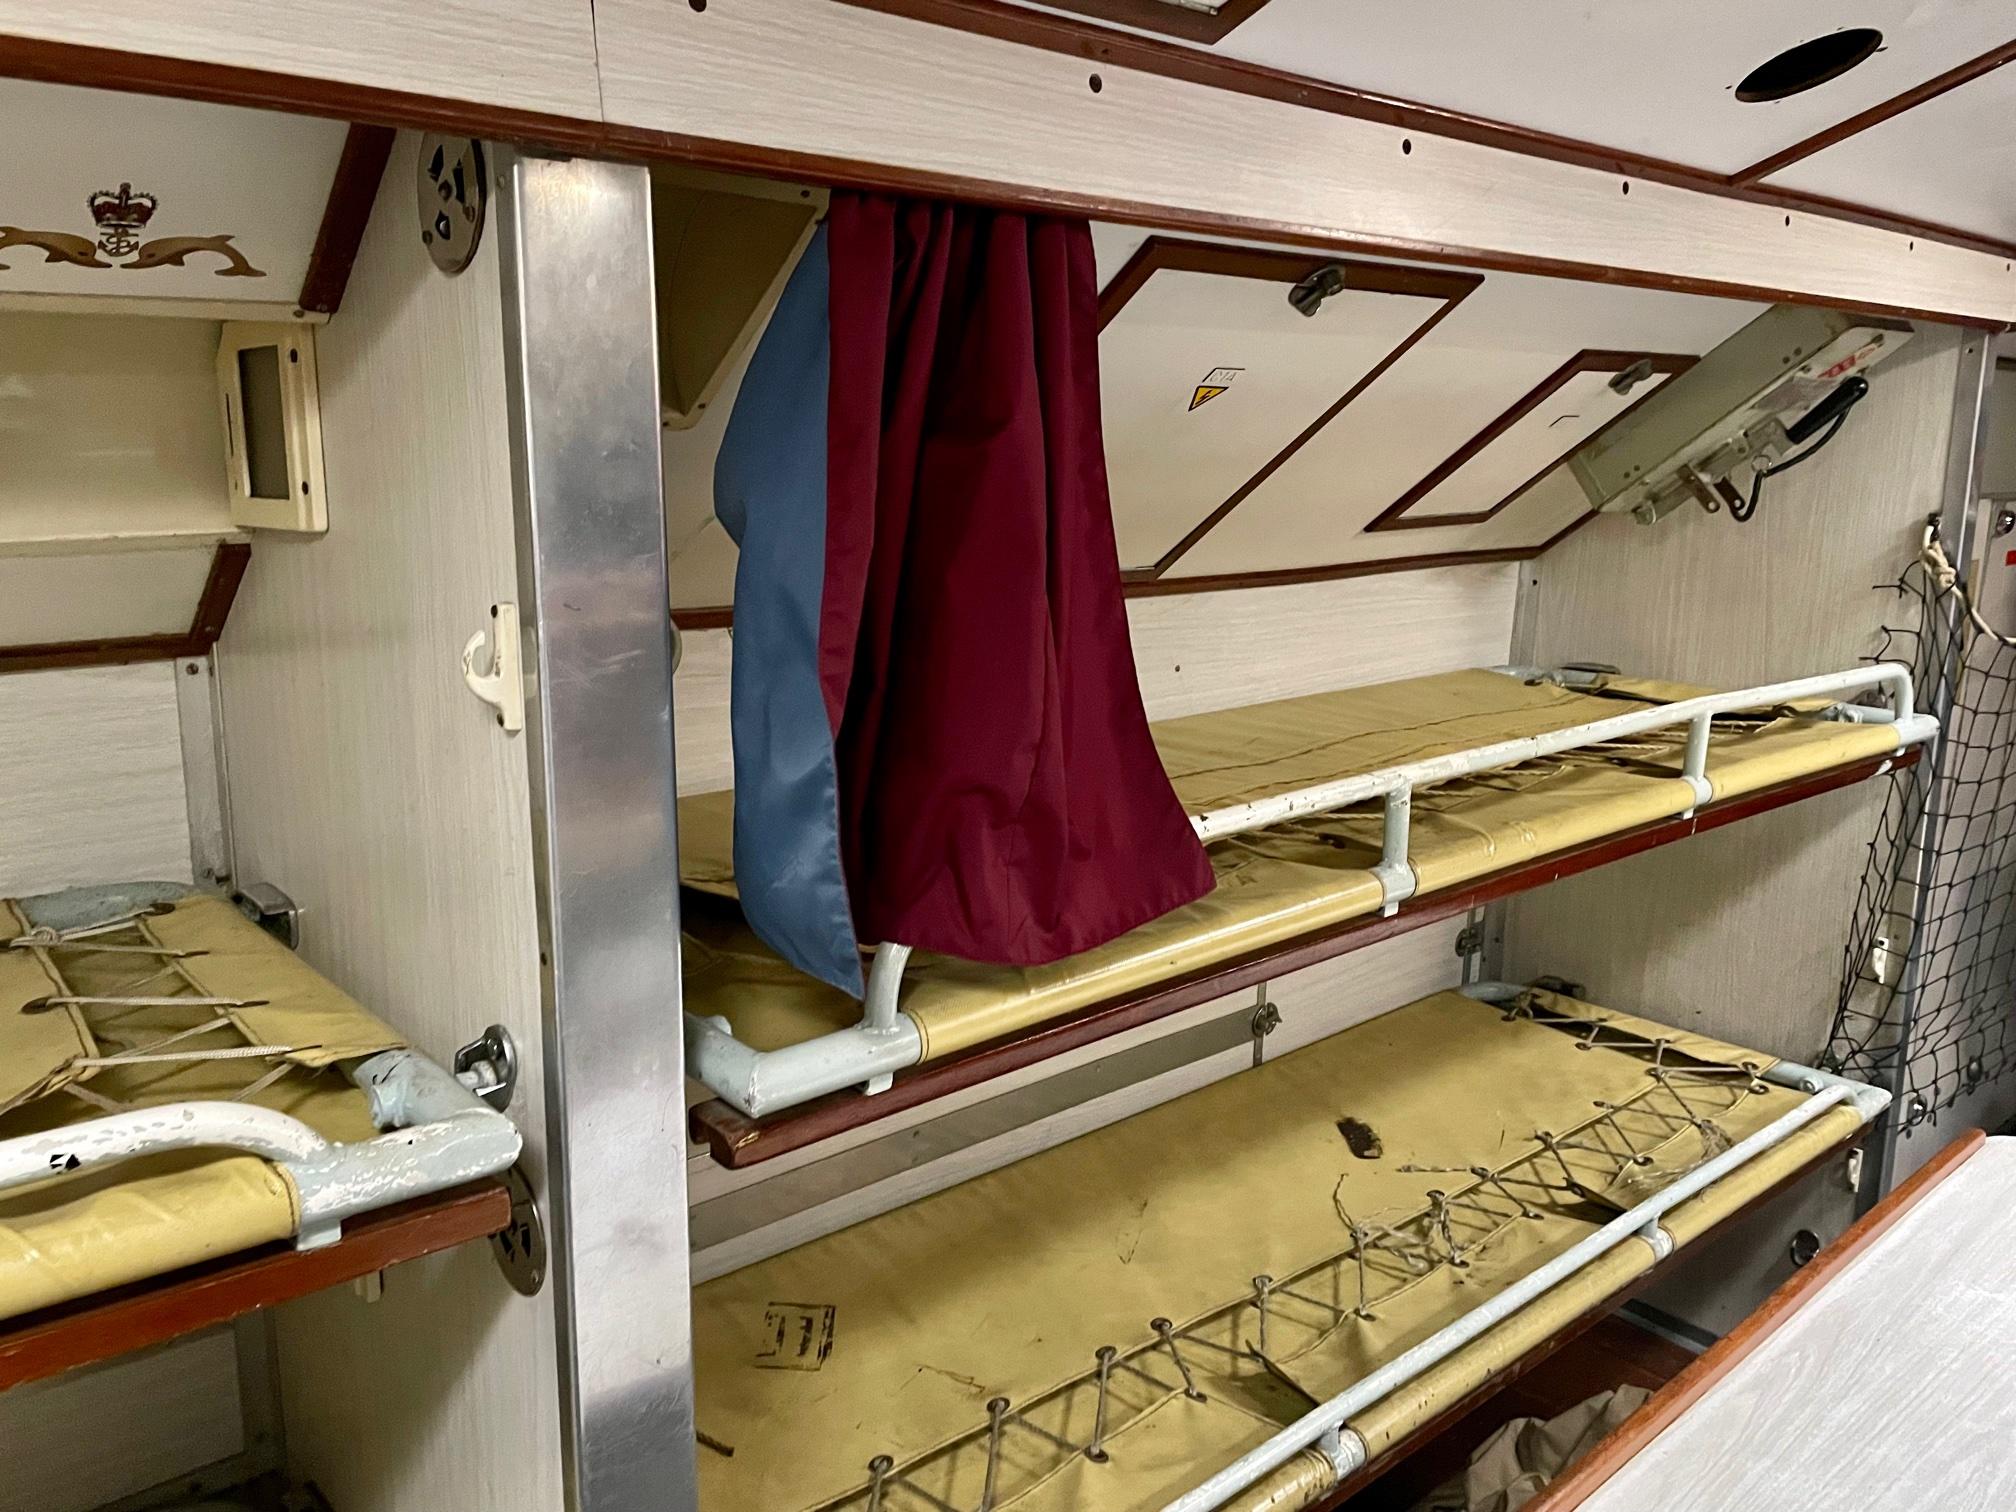 Submarine Ocelot interior bunk beds